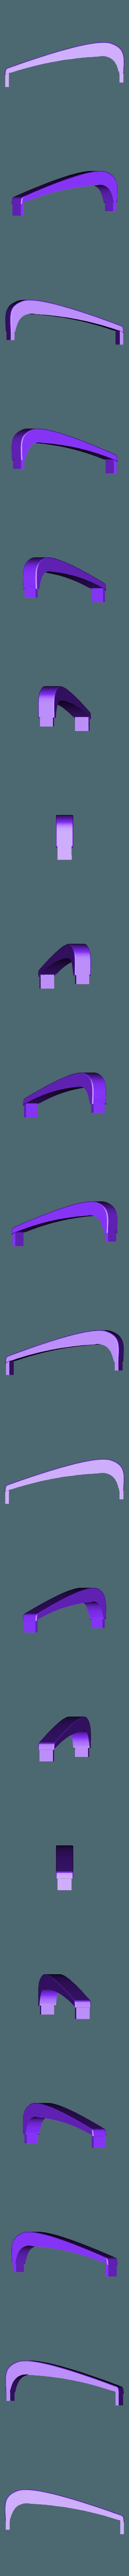 Patte.stl Download free STL file Plasmid vial remix (separate parts + screwable head) • 3D print model, conceptify